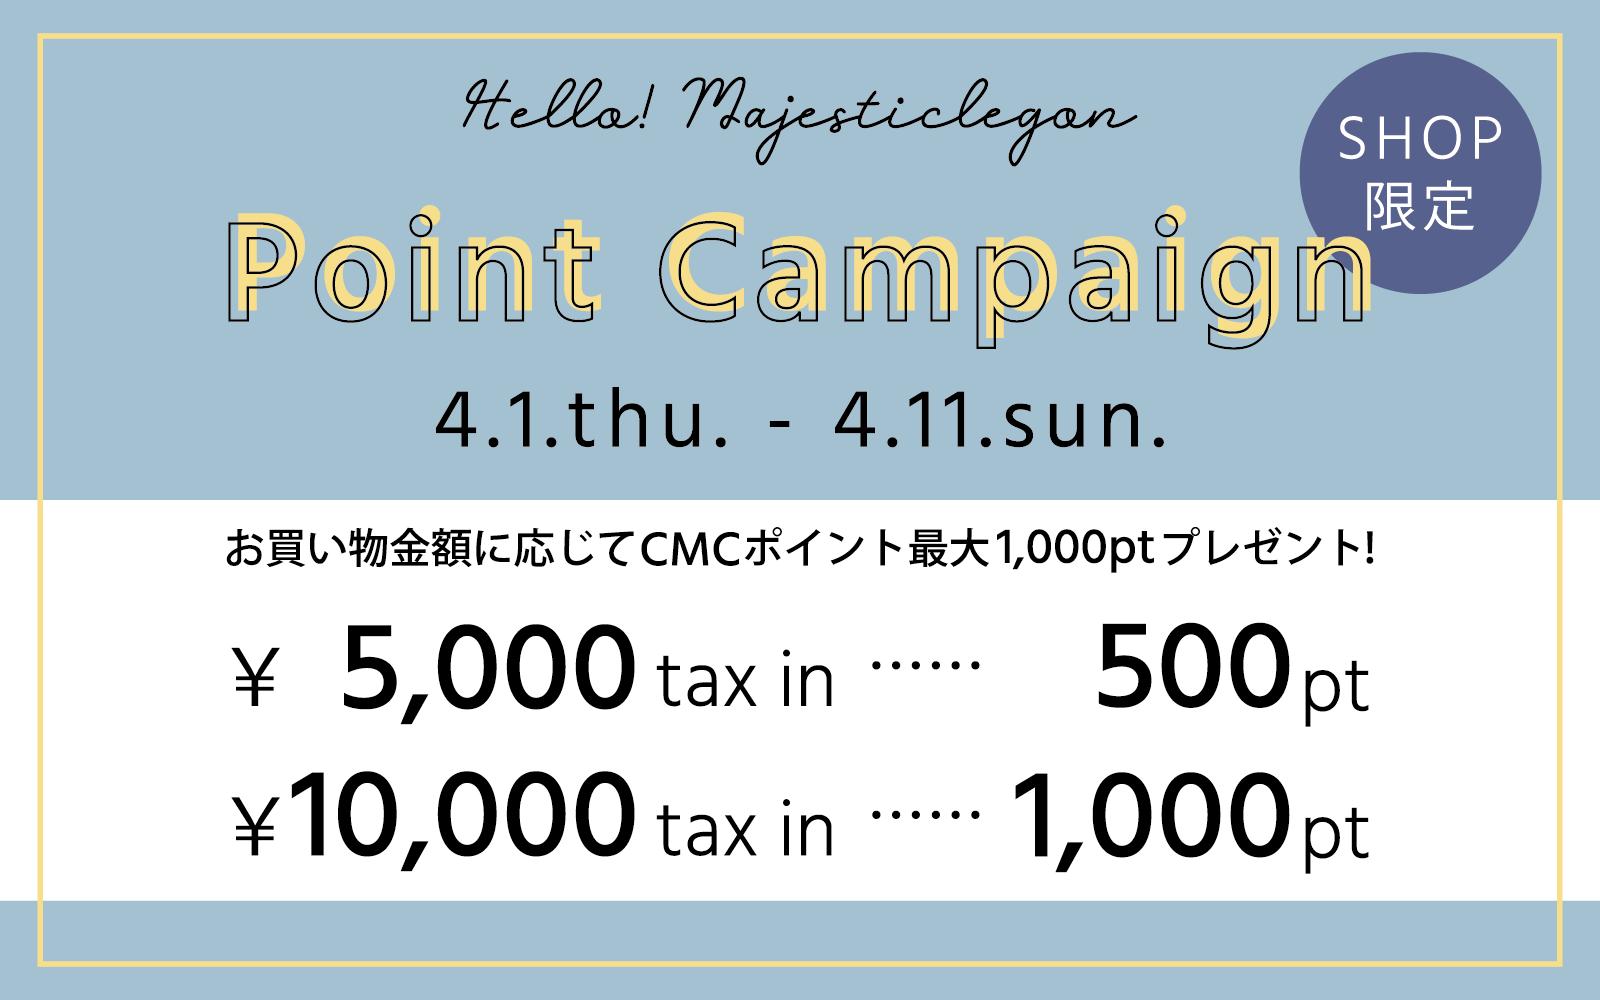 【SHOP限定】HELLO majesticlegon! point campaign♡ 4.1.thu.START